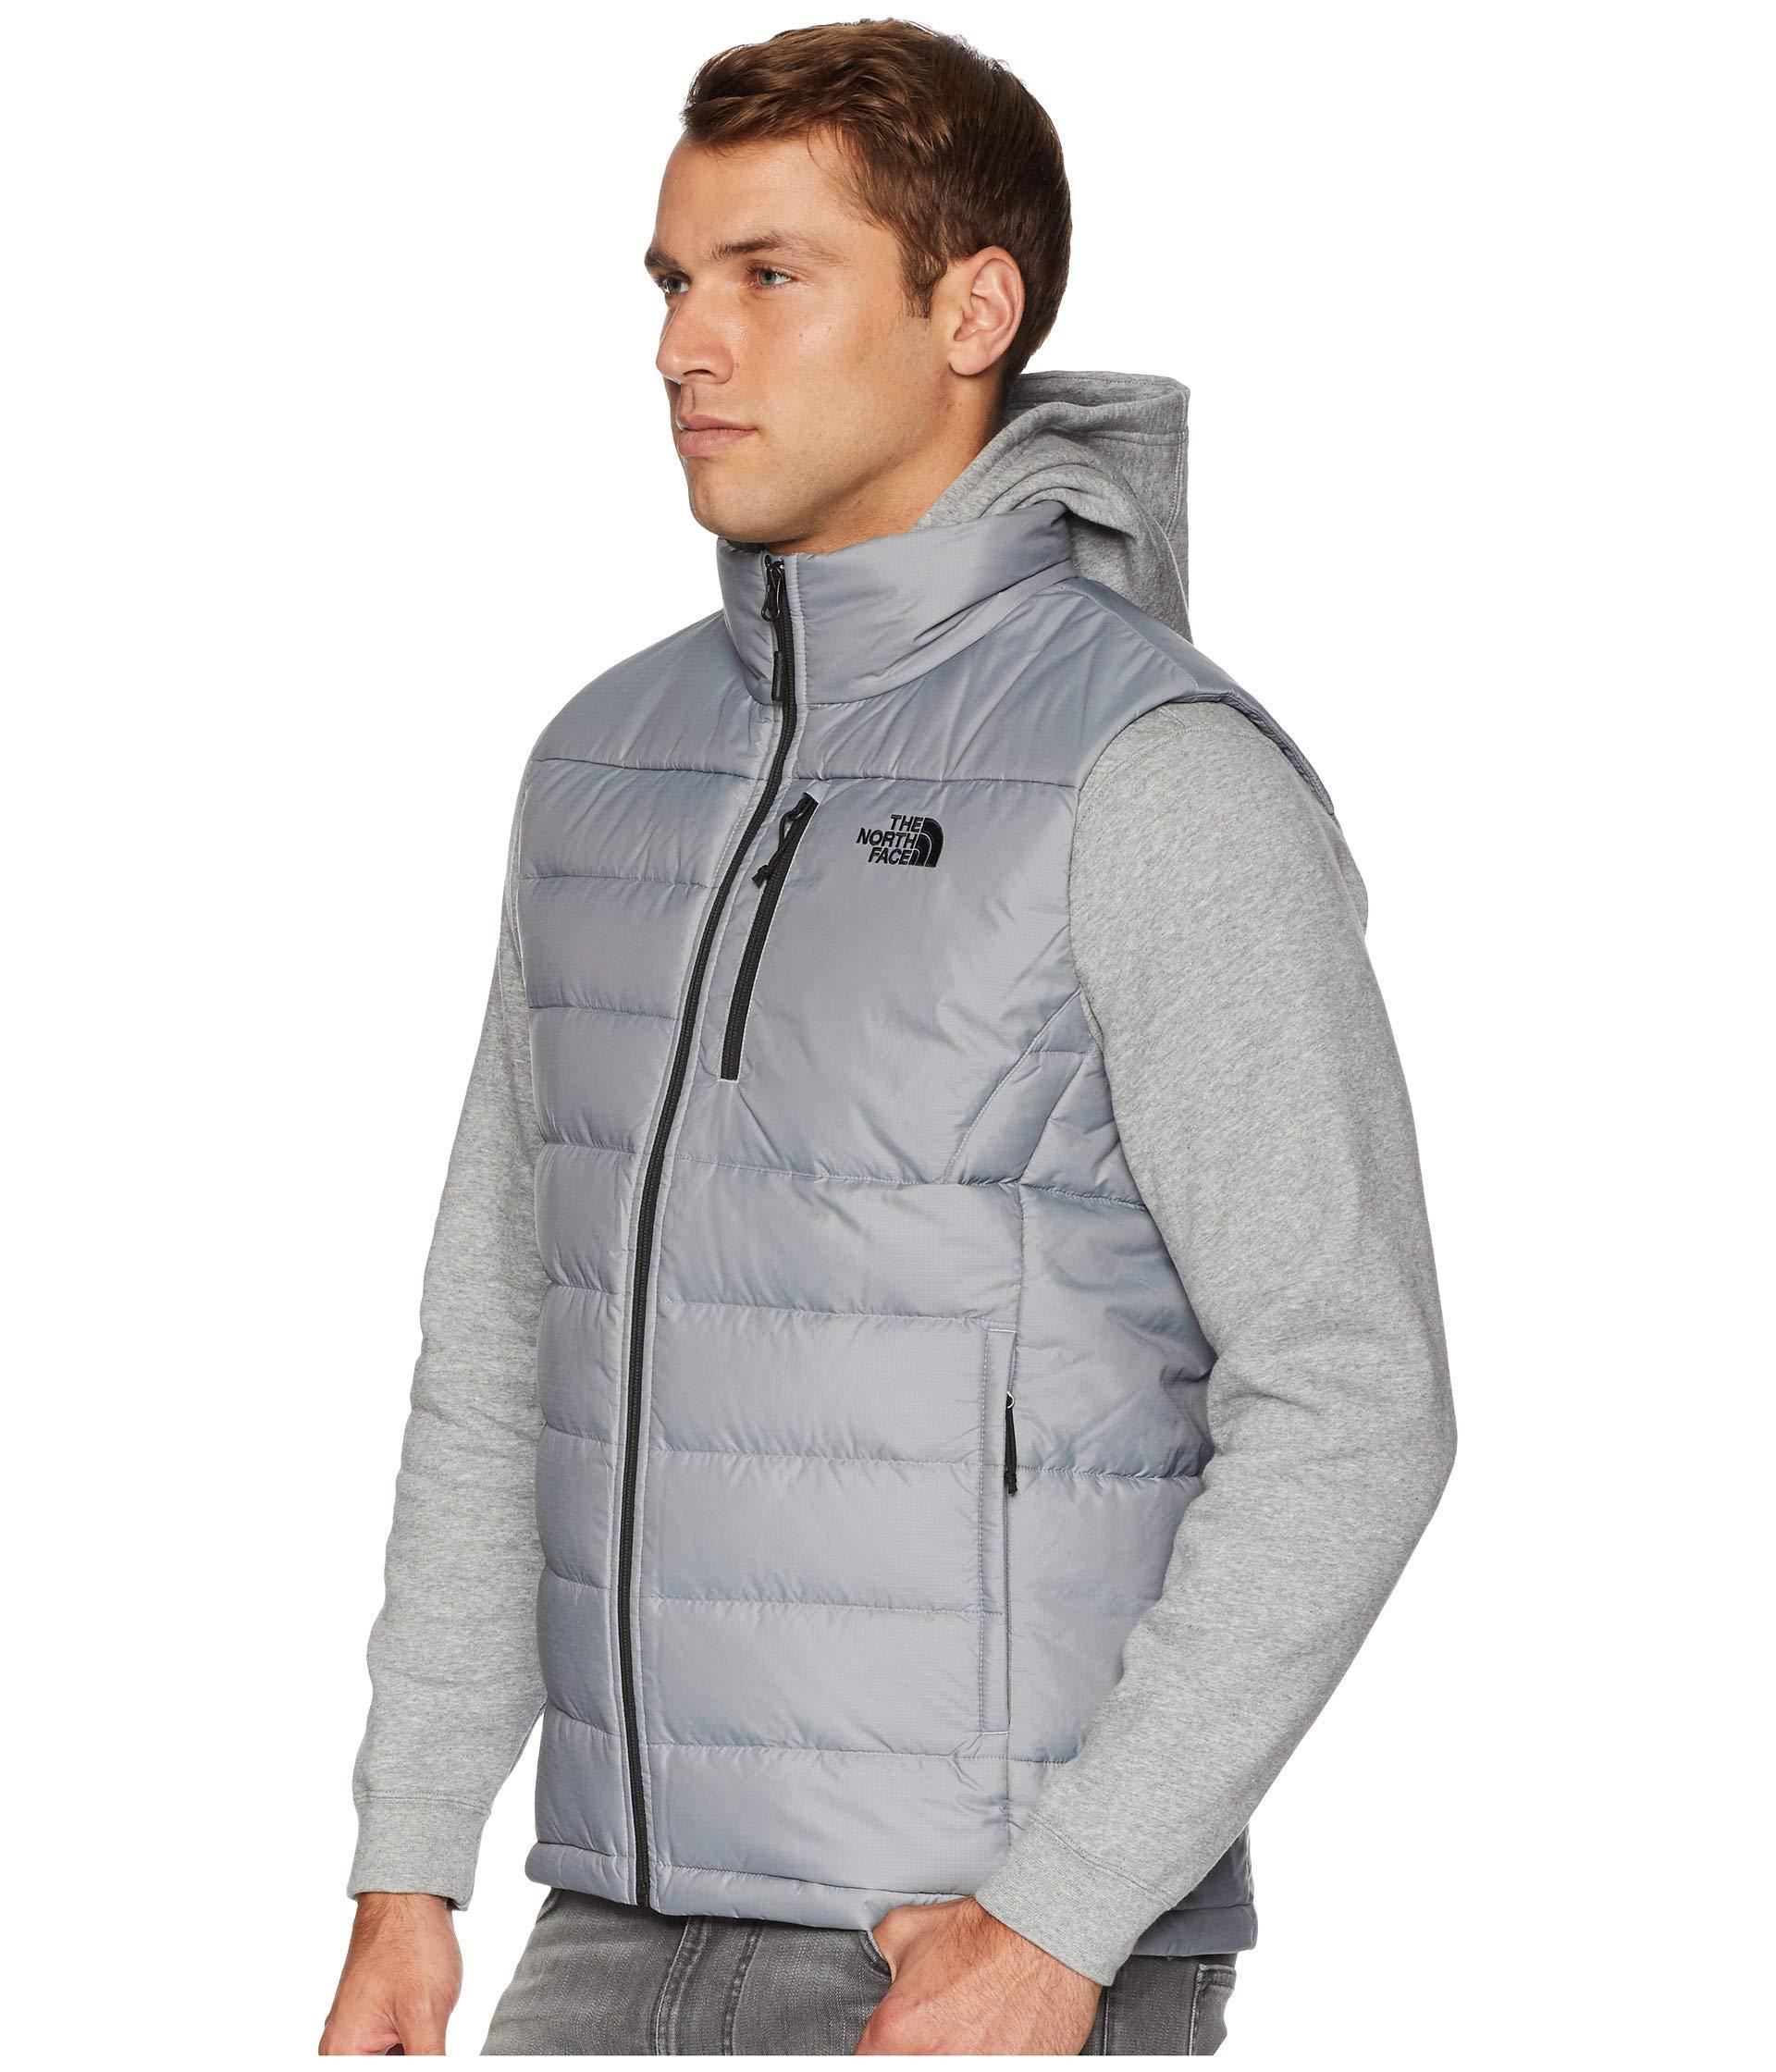 43d9279c70 Lyst - The North Face Aconcagua Vest (mid Grey) Men s Vest in Gray for Men